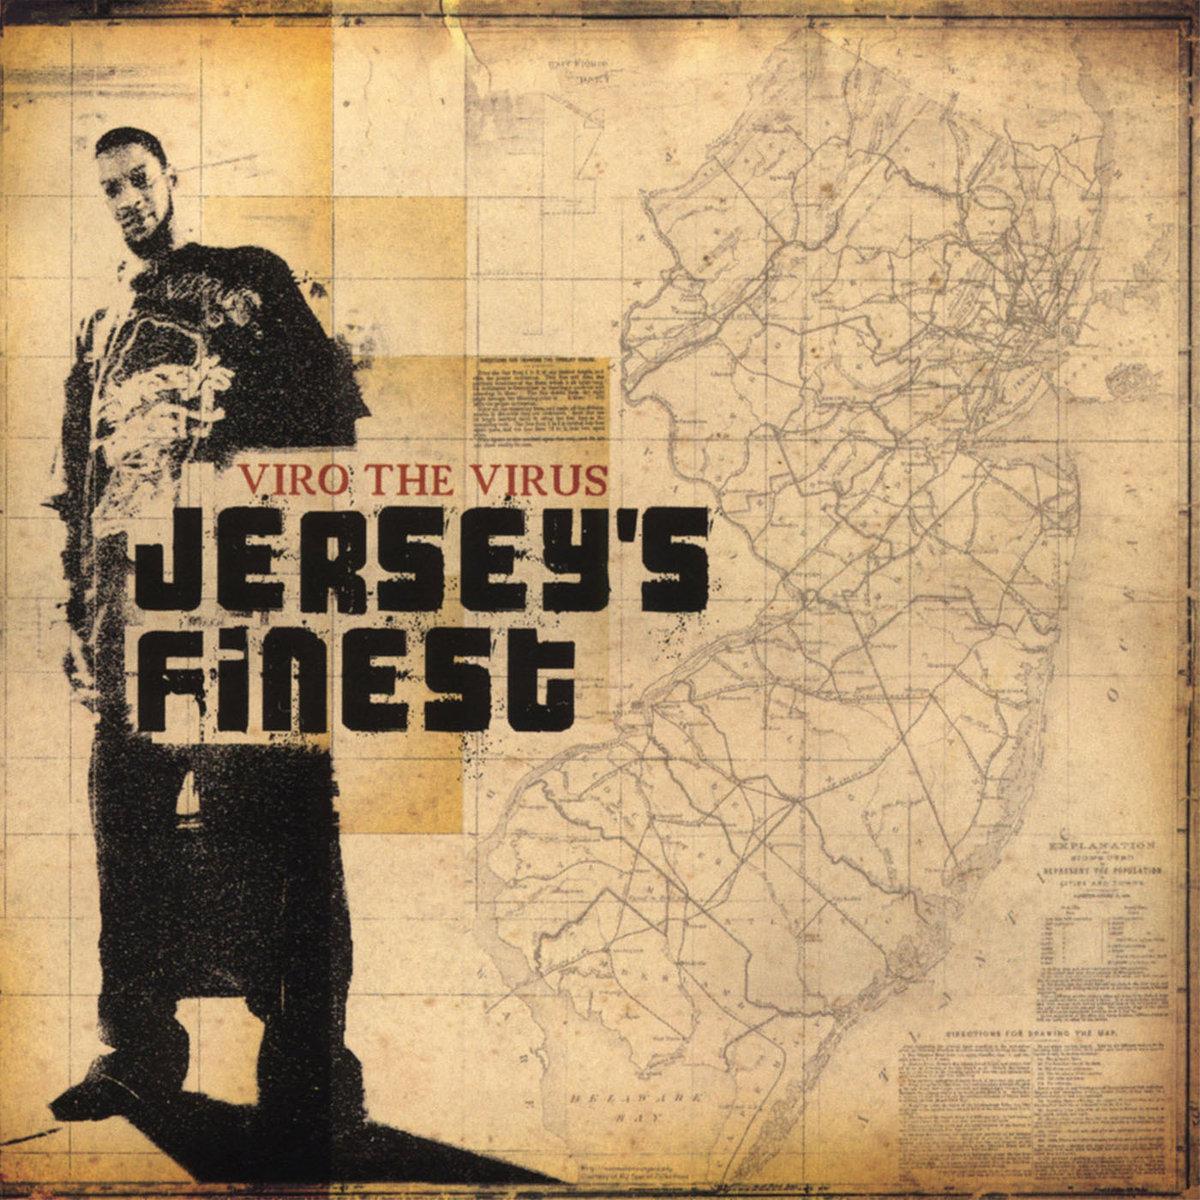 Viro_the_virush_presenta_jersey_s_finest